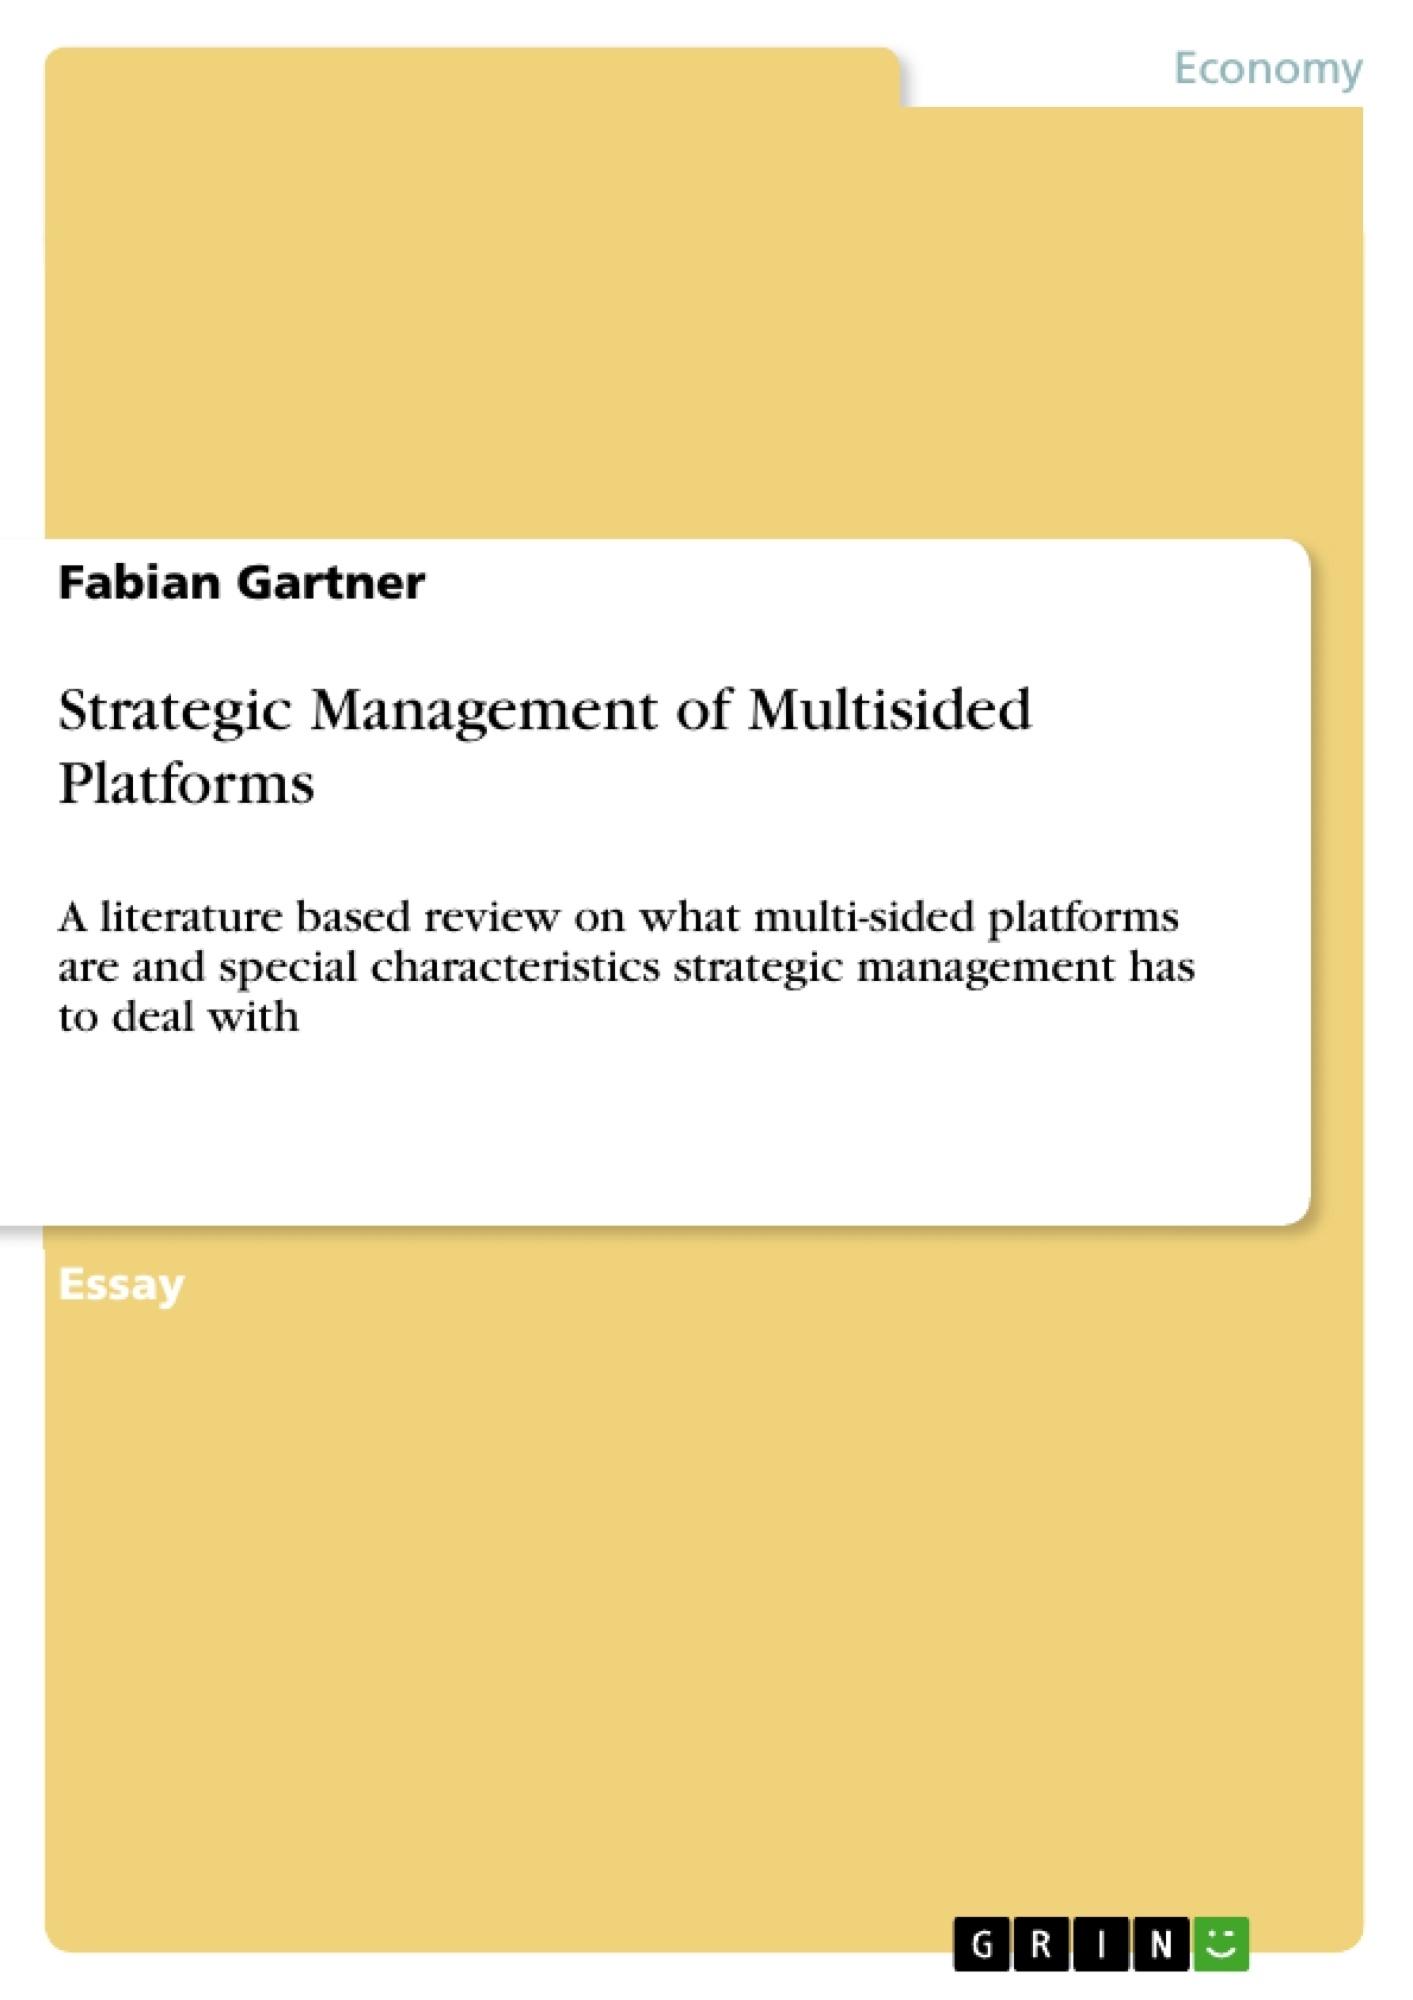 Title: Strategic Management of Multisided Platforms